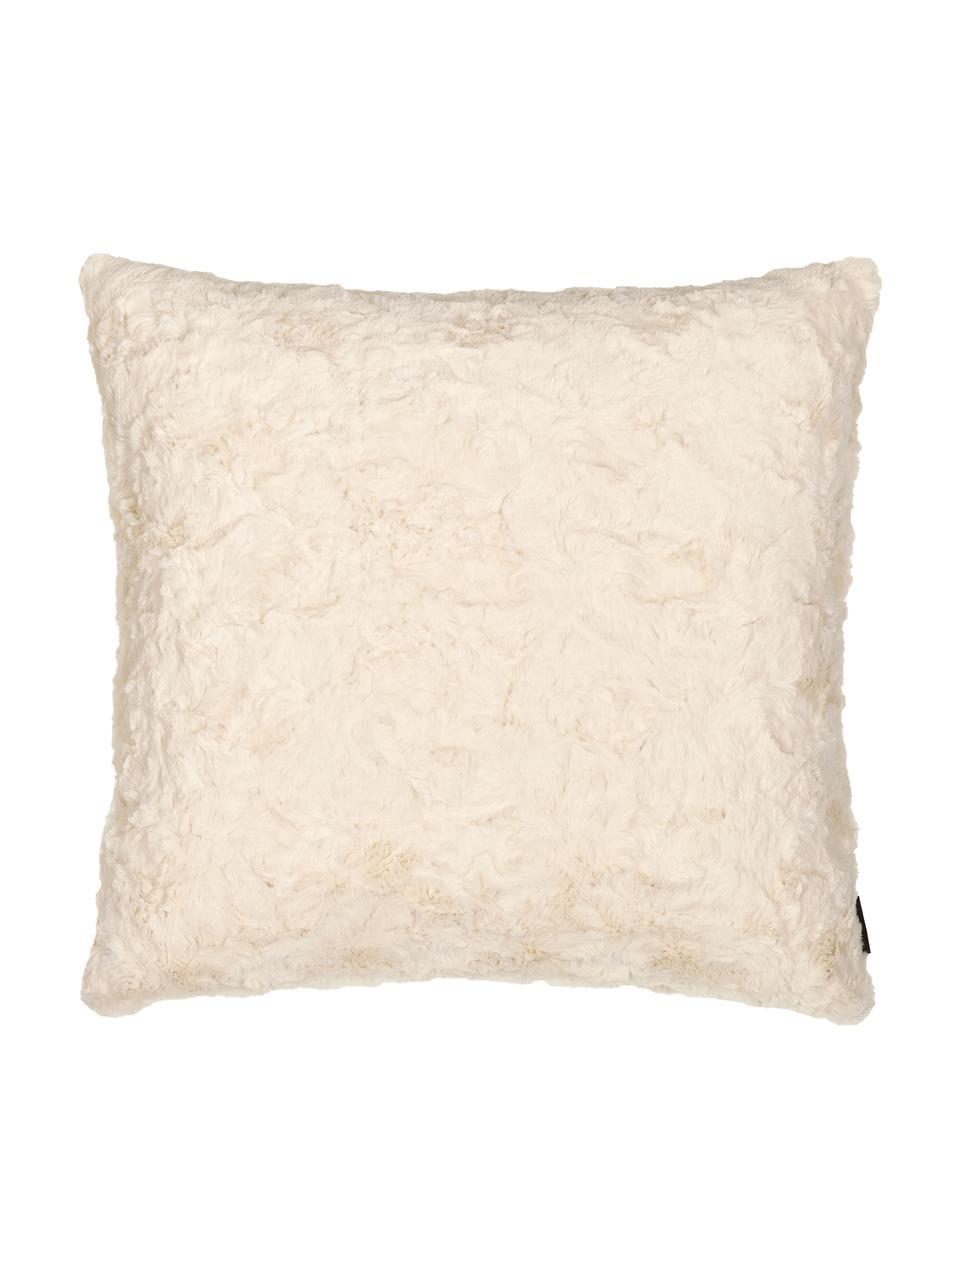 Federa arredo in soffice pelliccia sintetica color bianco crema Isis, 100% poliestere, Bianco crema, Larg. 45 x Lung. 45 cm